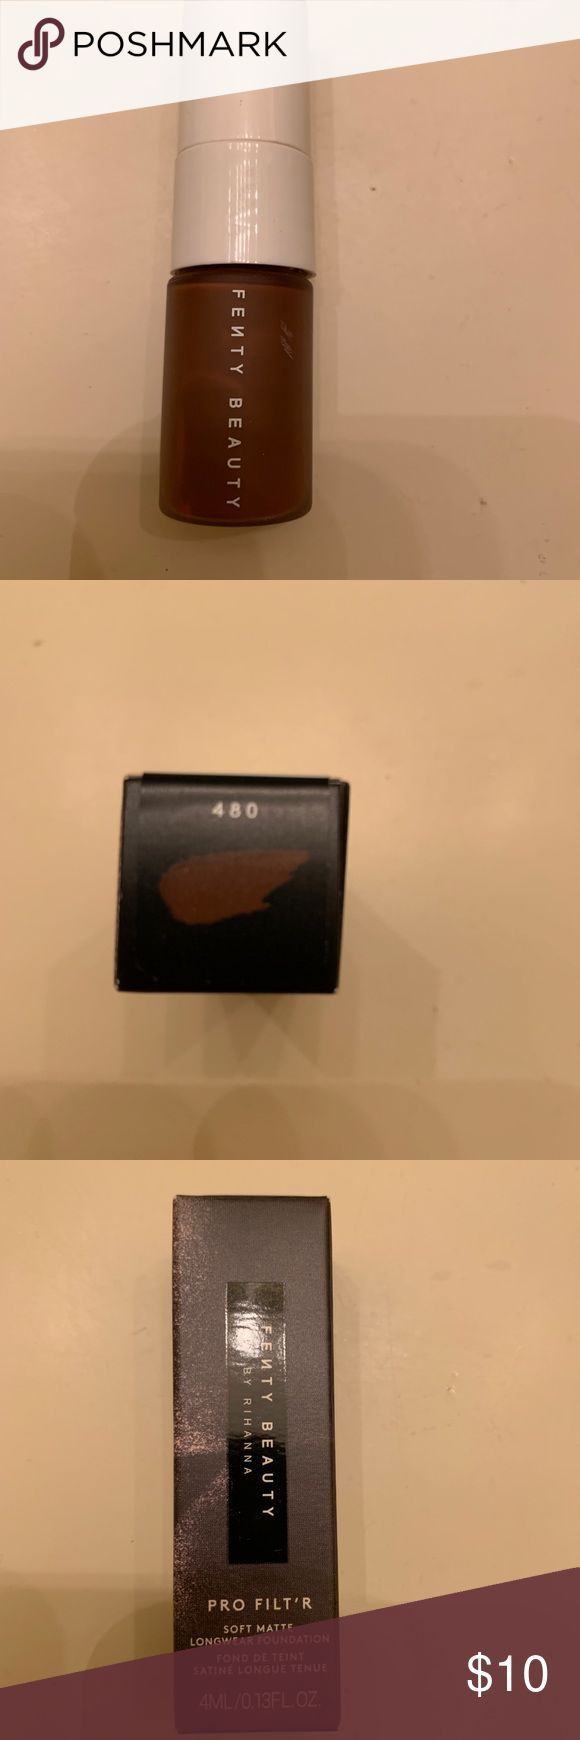 NEU Fenty Magnificence Professional Filtr Basis 480 NEU Fenty Magnificence Professional Filtr Delicate